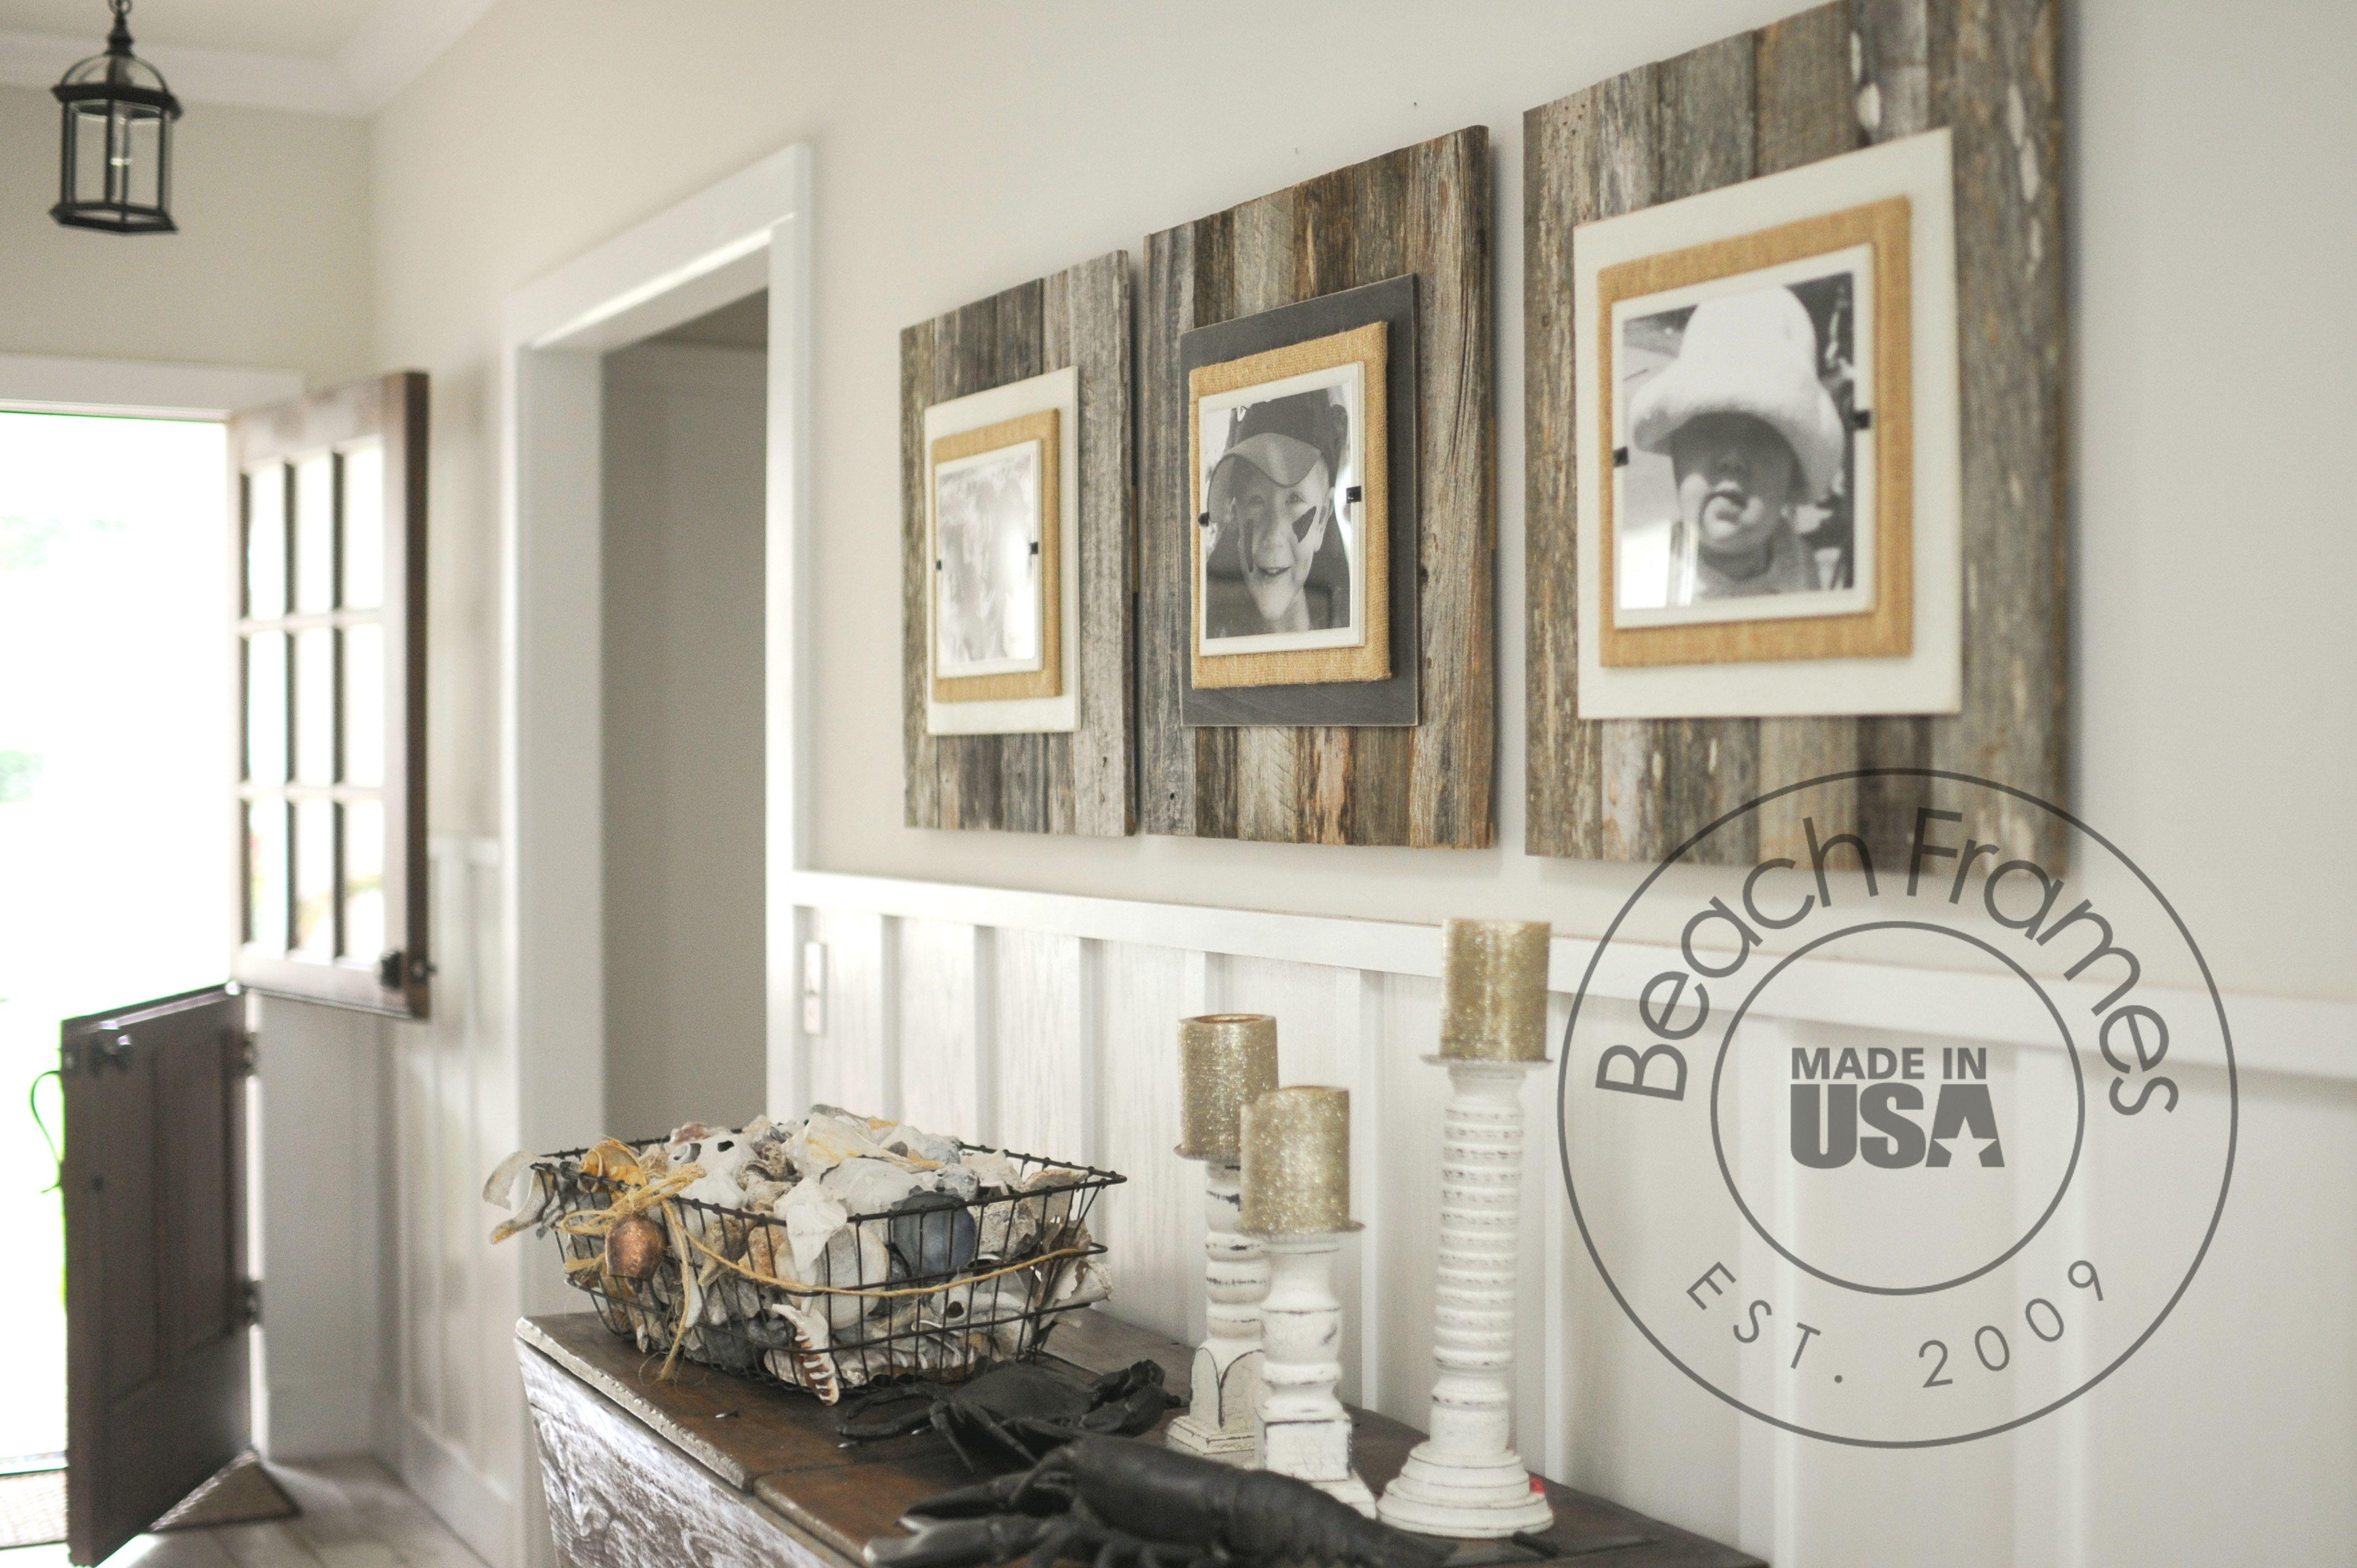 25% off limited time saleon extra large reclaimed wood frames. Enter ...